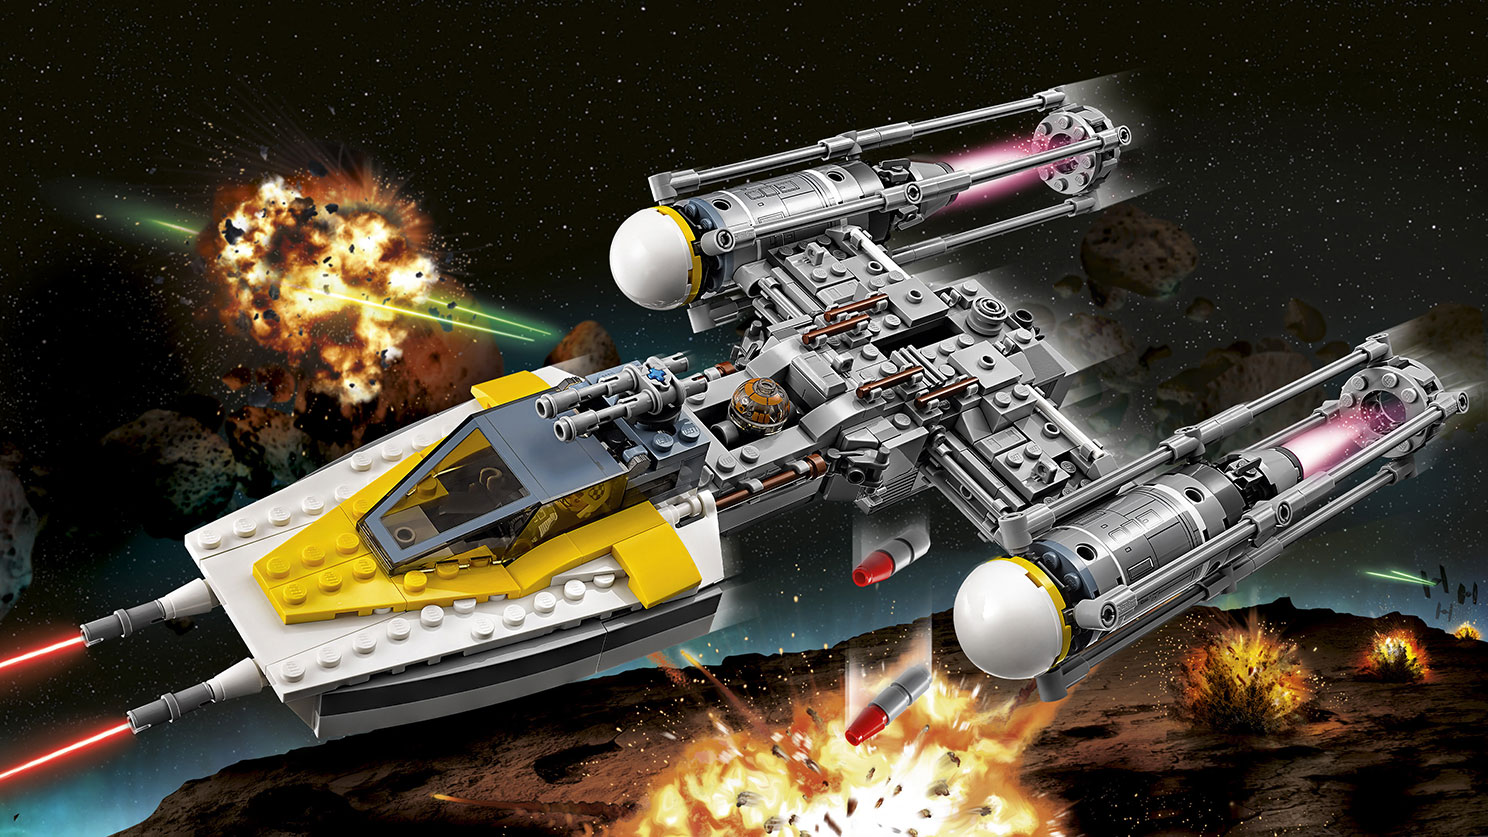 75172 Y-wing Starfighter